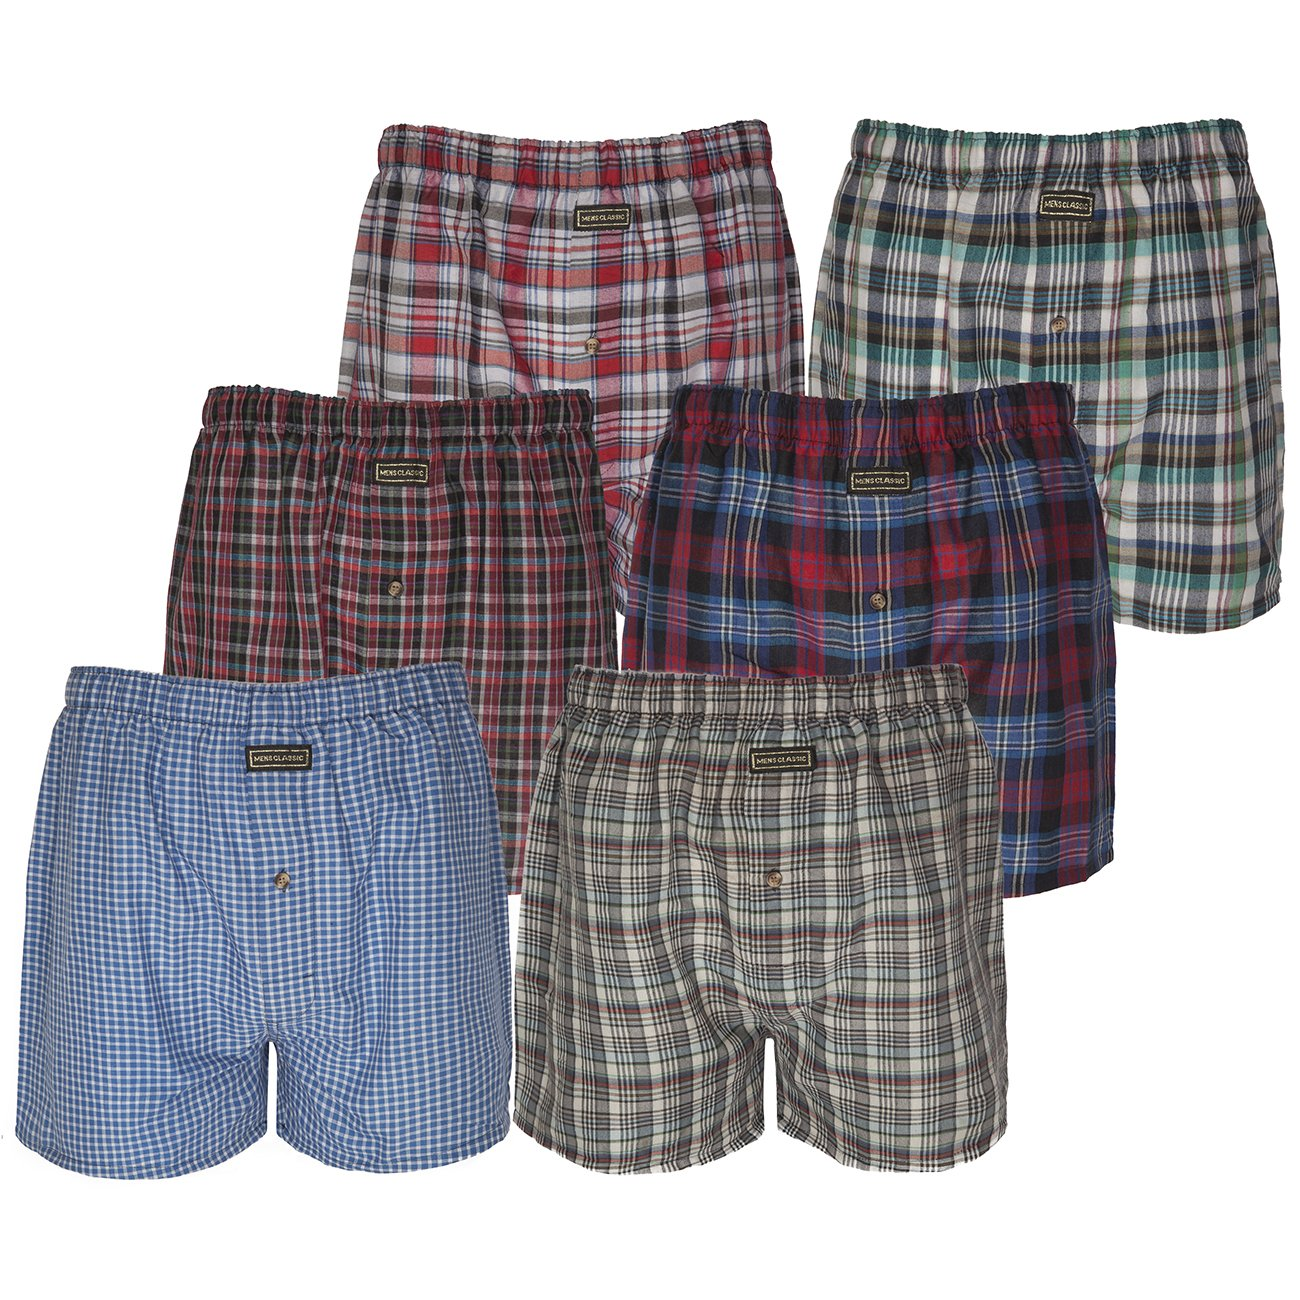 3 //6// 9 mens woven check boxer shorts cotton rich underwear breifs short trunks